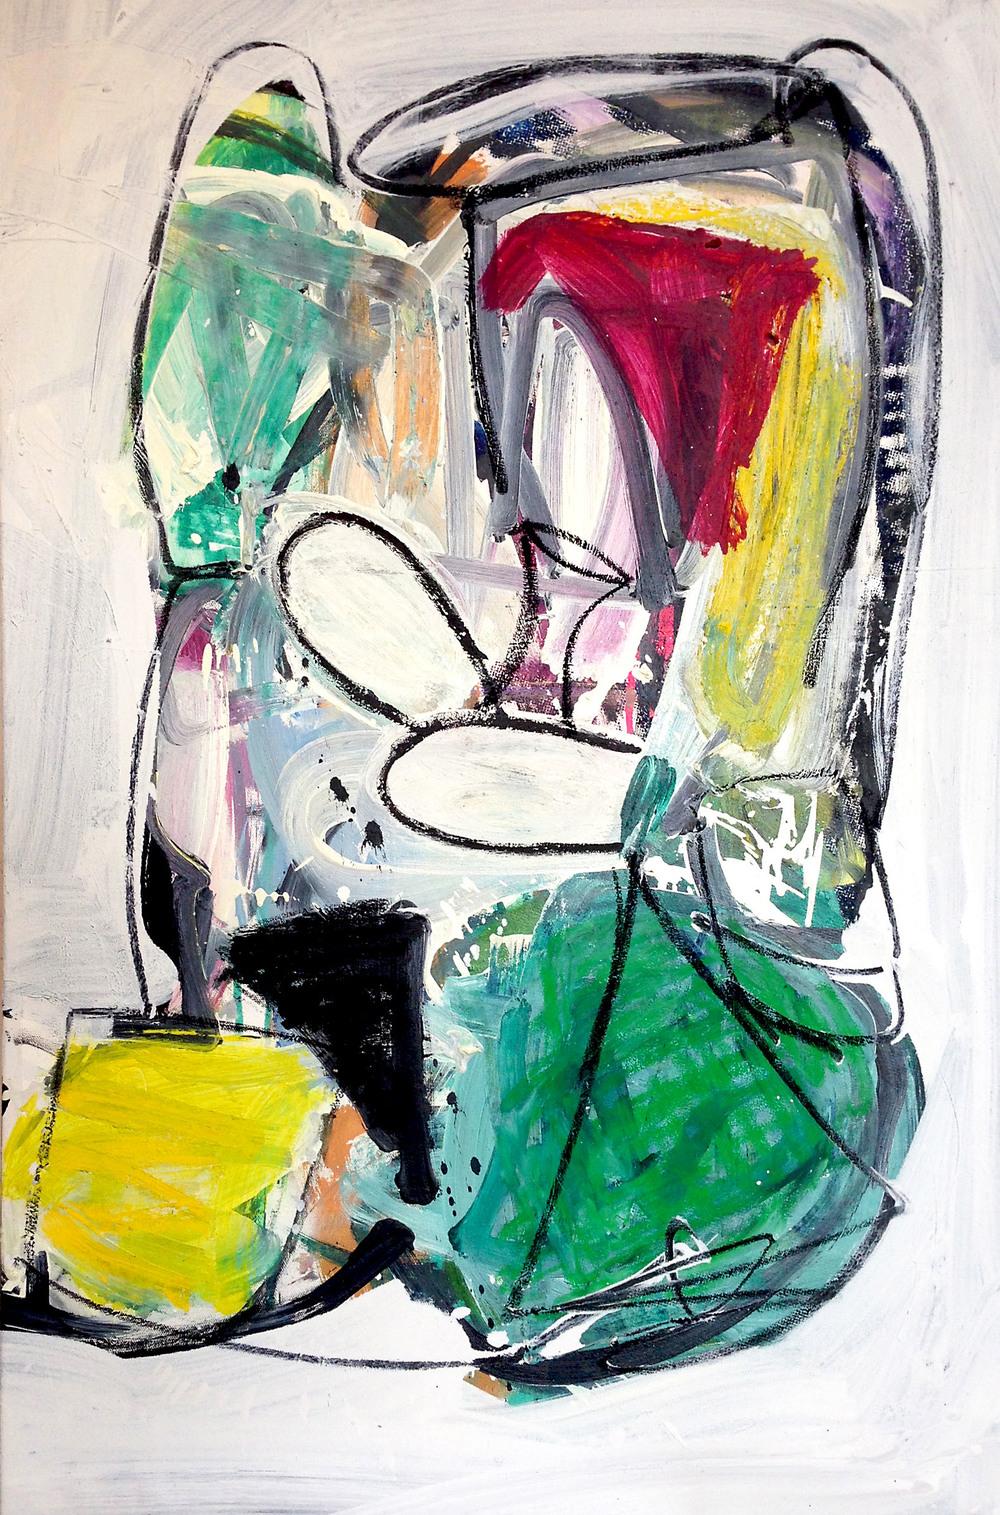 """pfff""  oil on canvas  36x24"